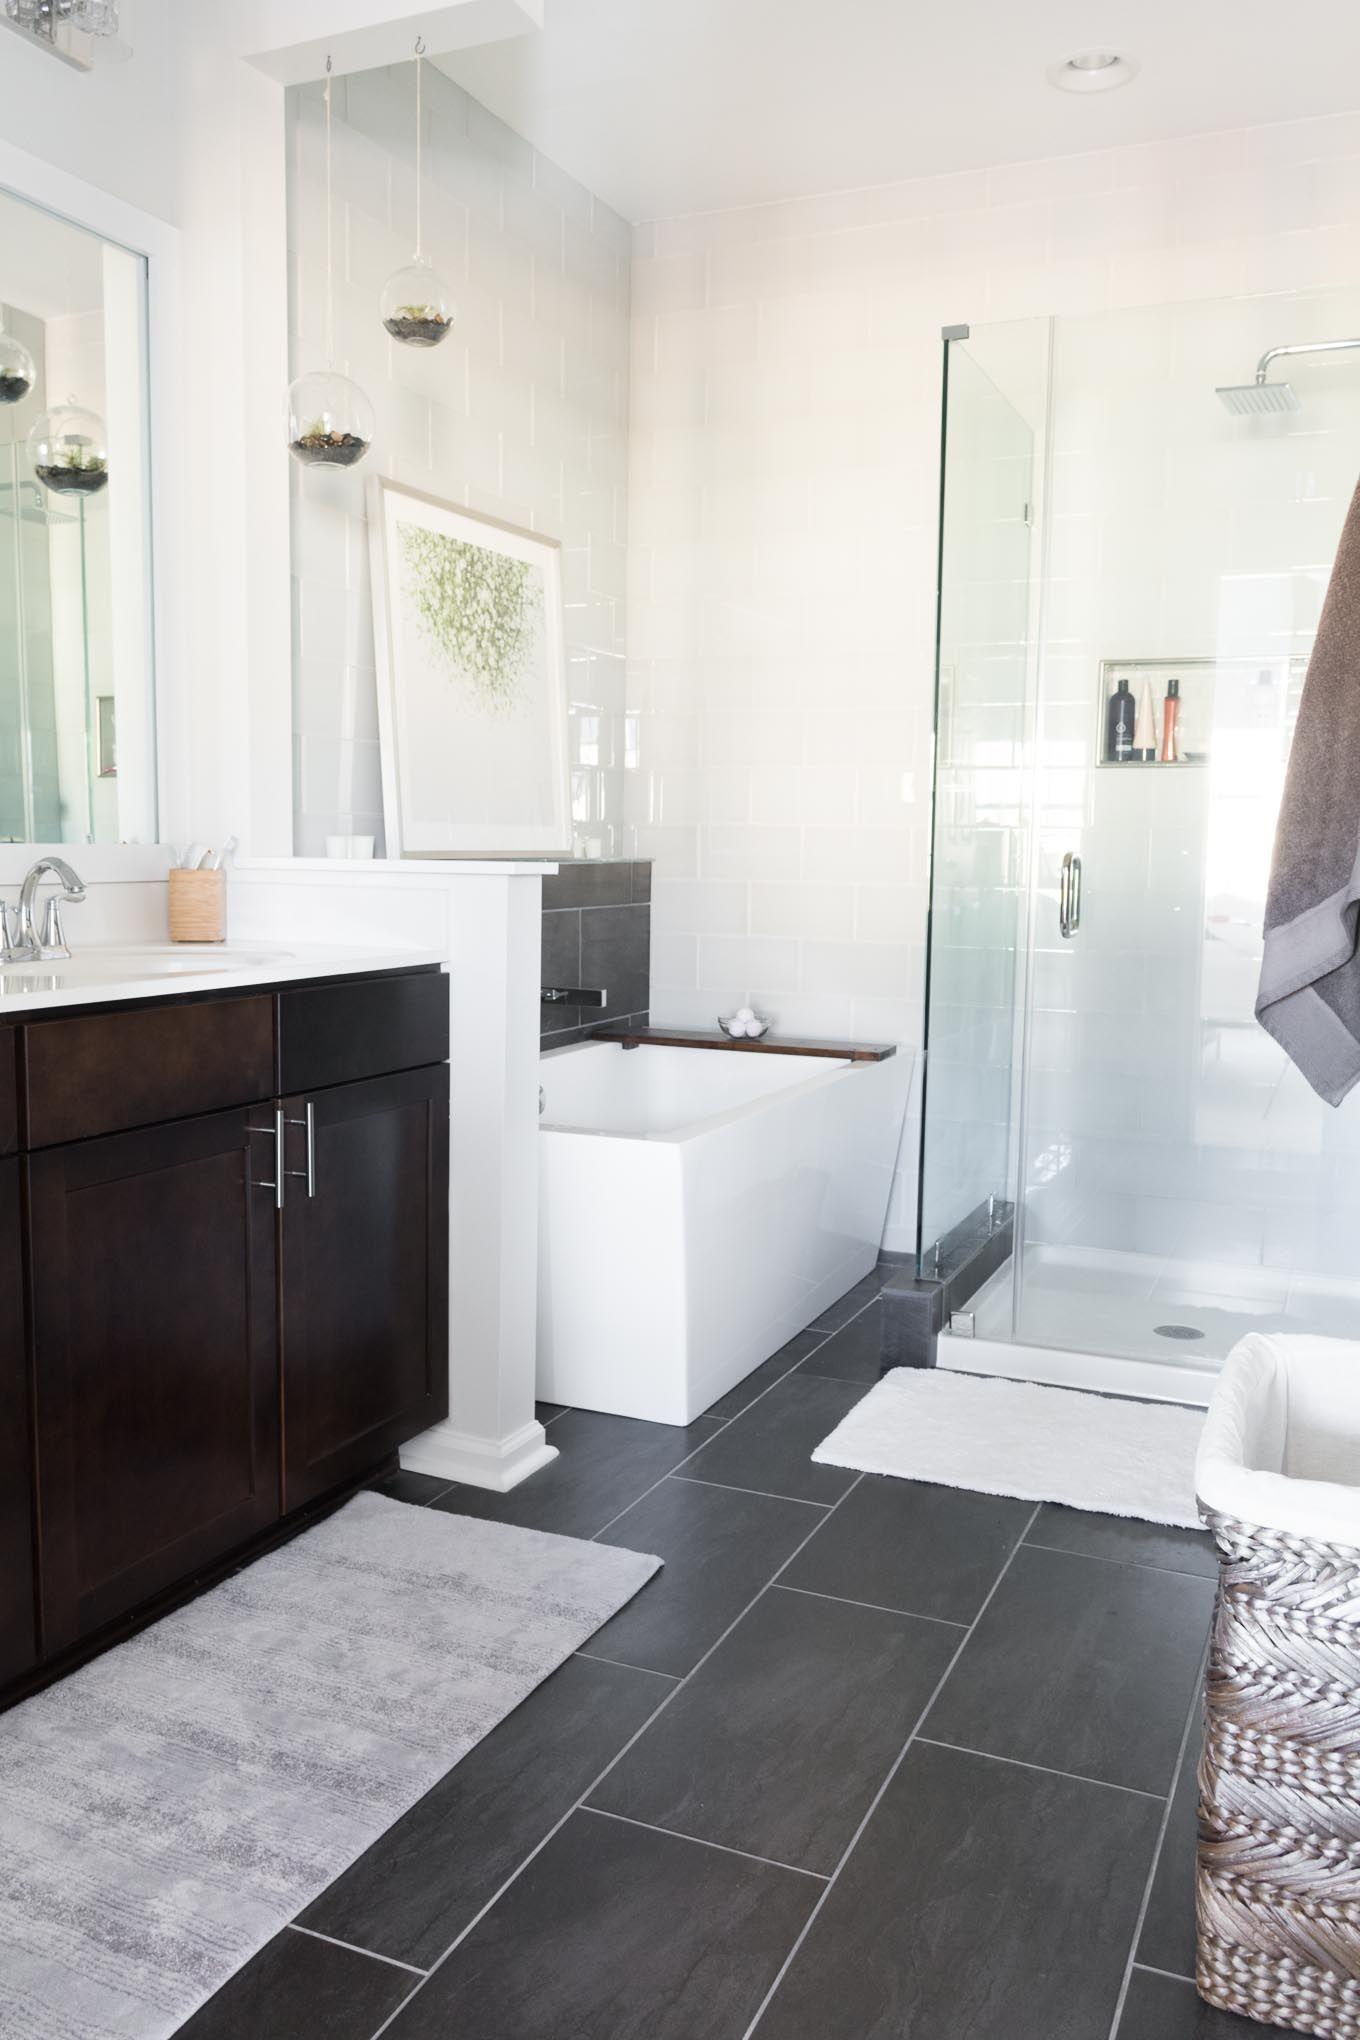 Modern Master Bathroom The Final One Room Challenge Reveal Modern Master Bathroom Master Bathroom Design Master Bathroom